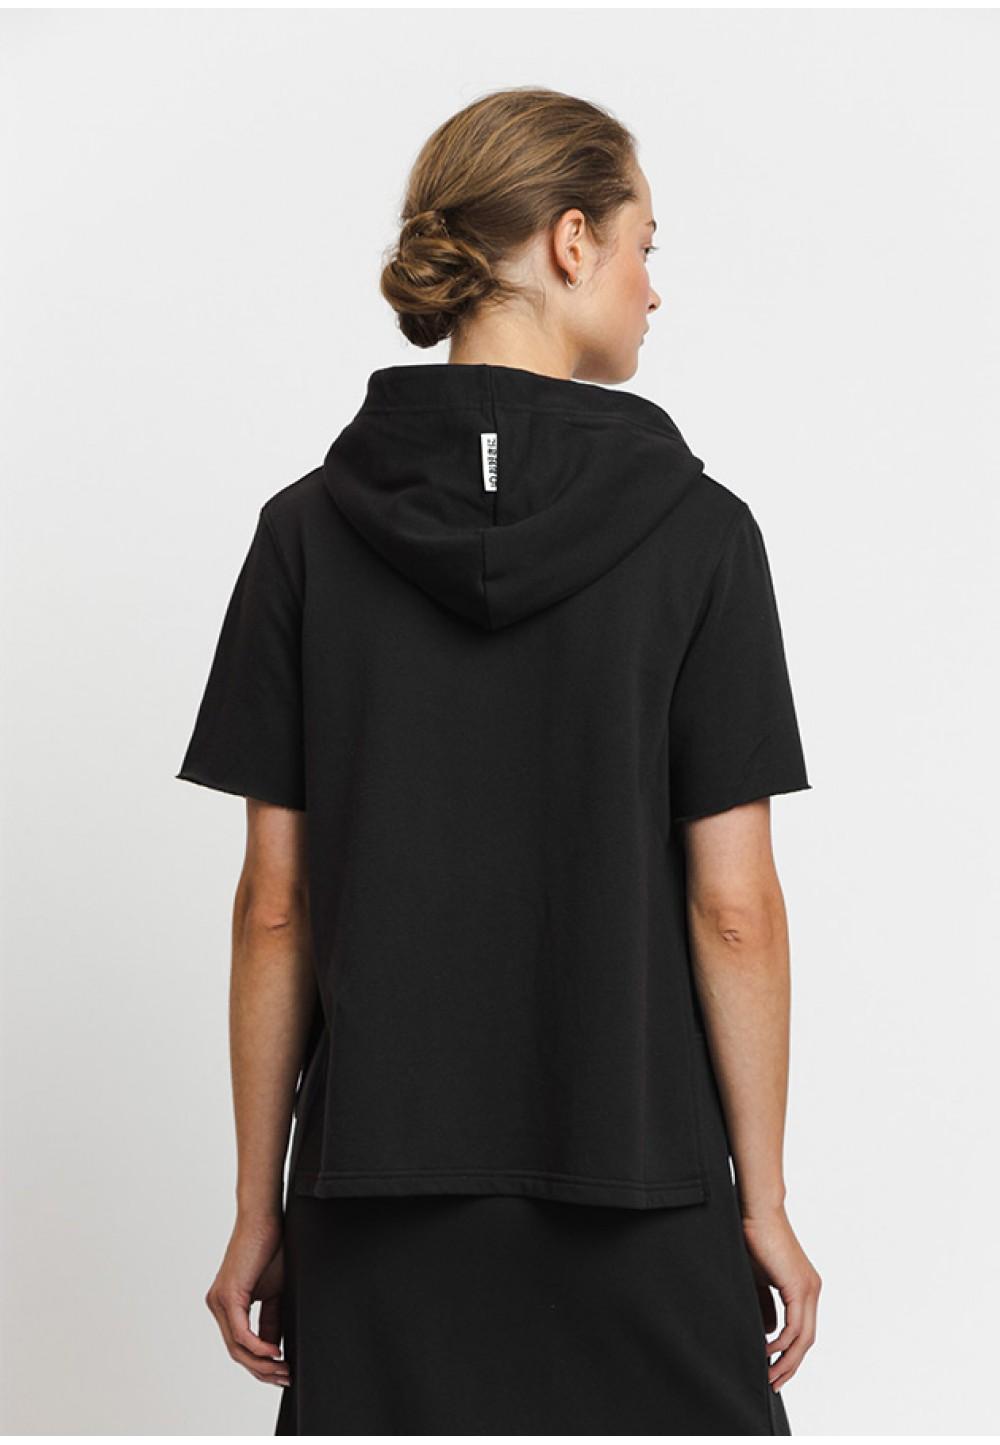 Черное худи с коротким рукавом